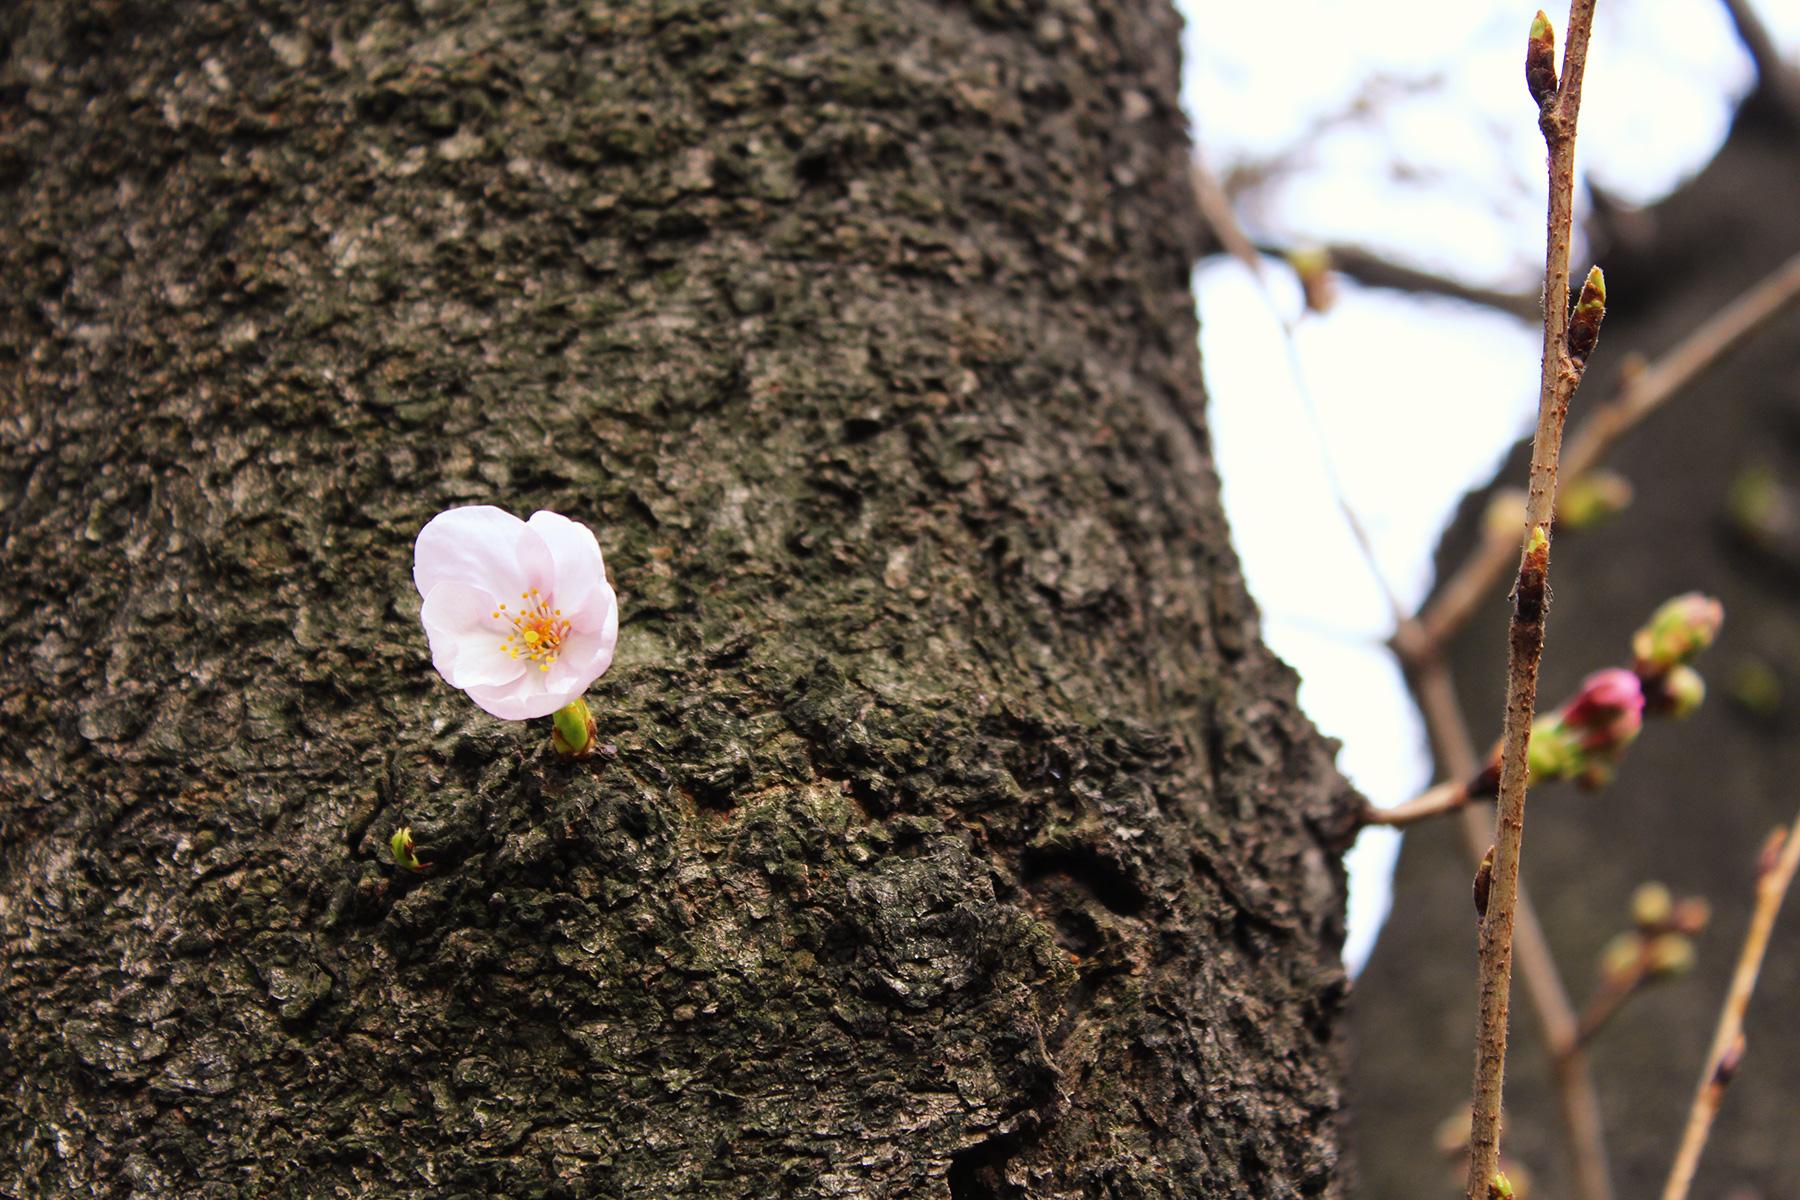 2017.03.18 目黒川の桜:予告編